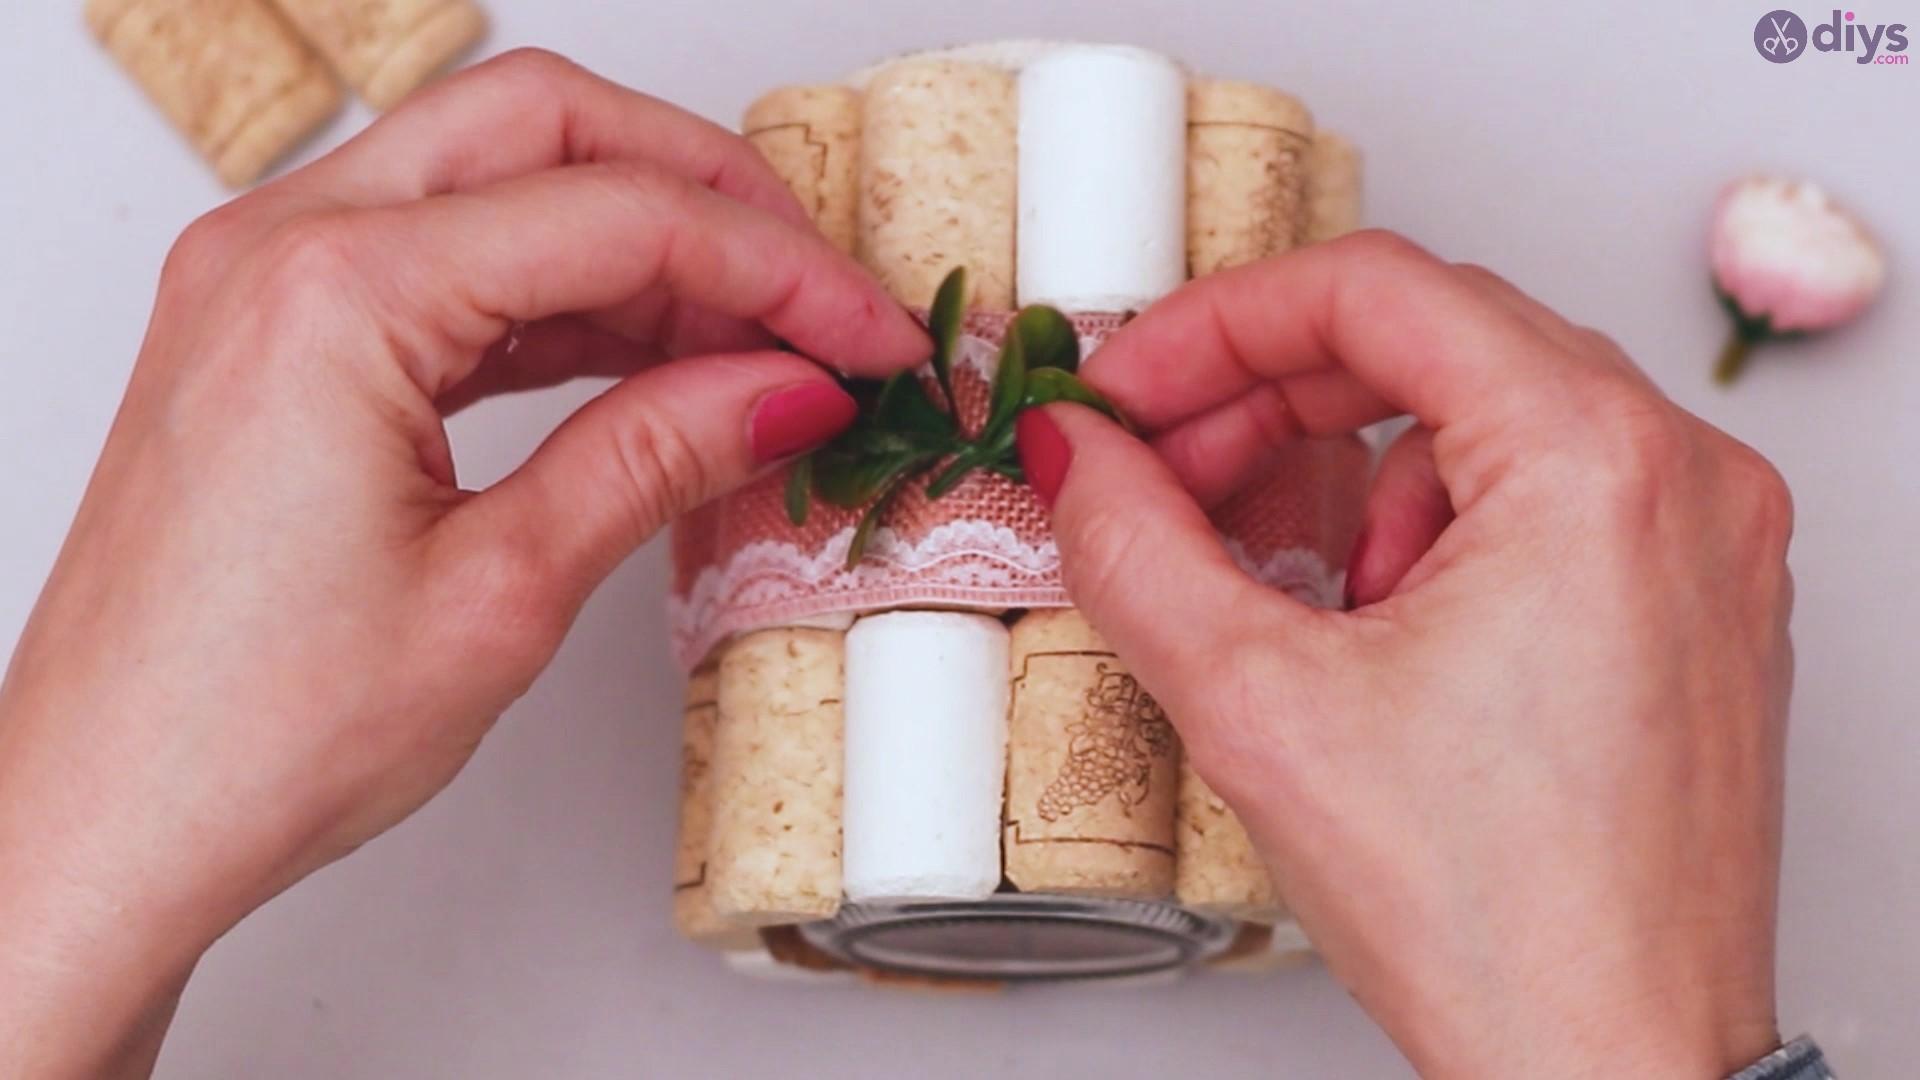 Diy wine cork flower vase (39)